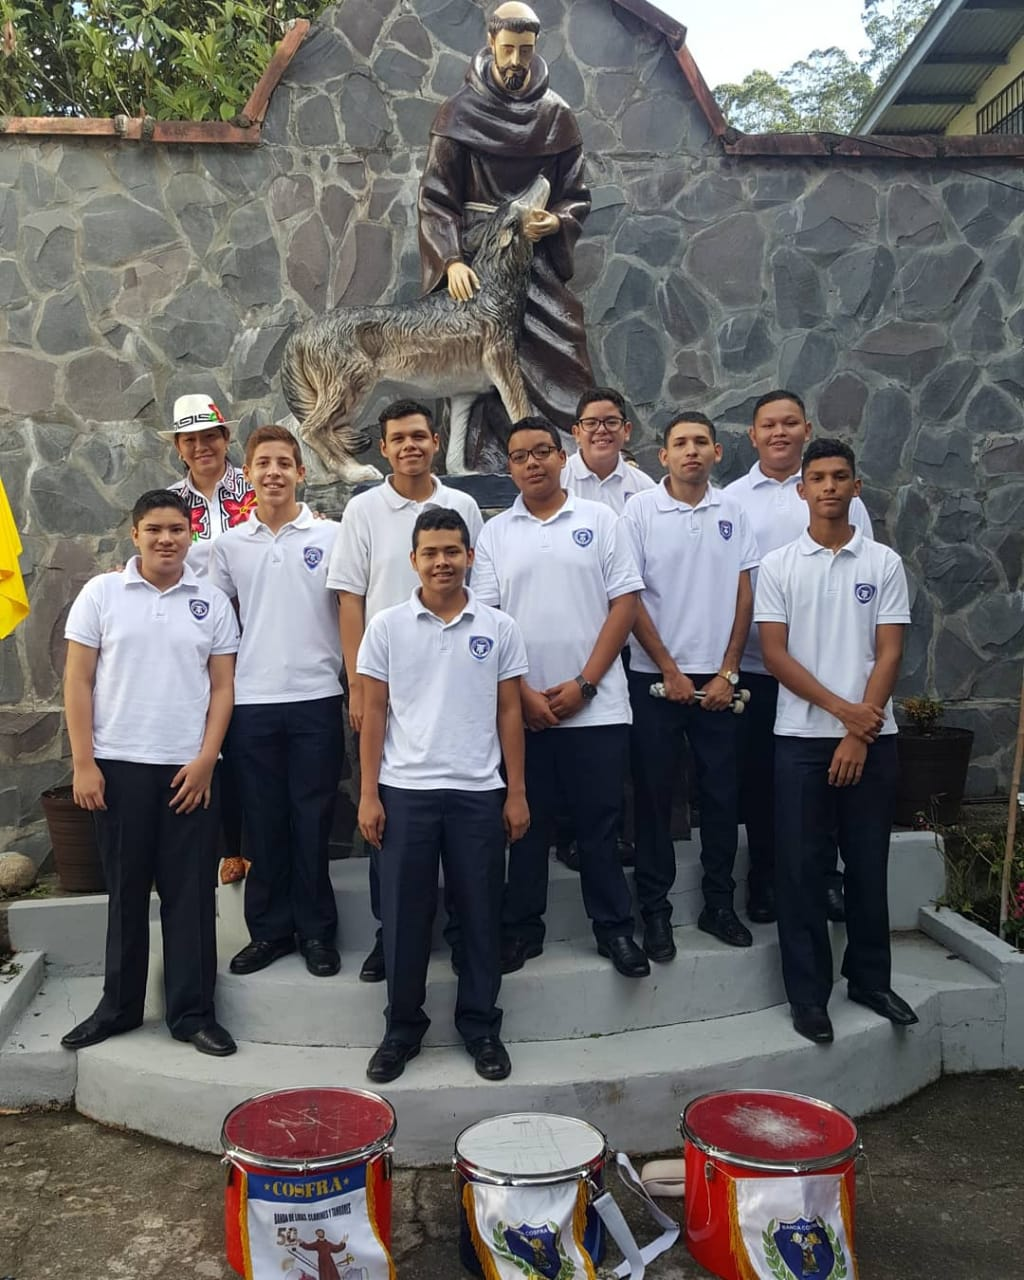 Banda - Aniversario Pio XII